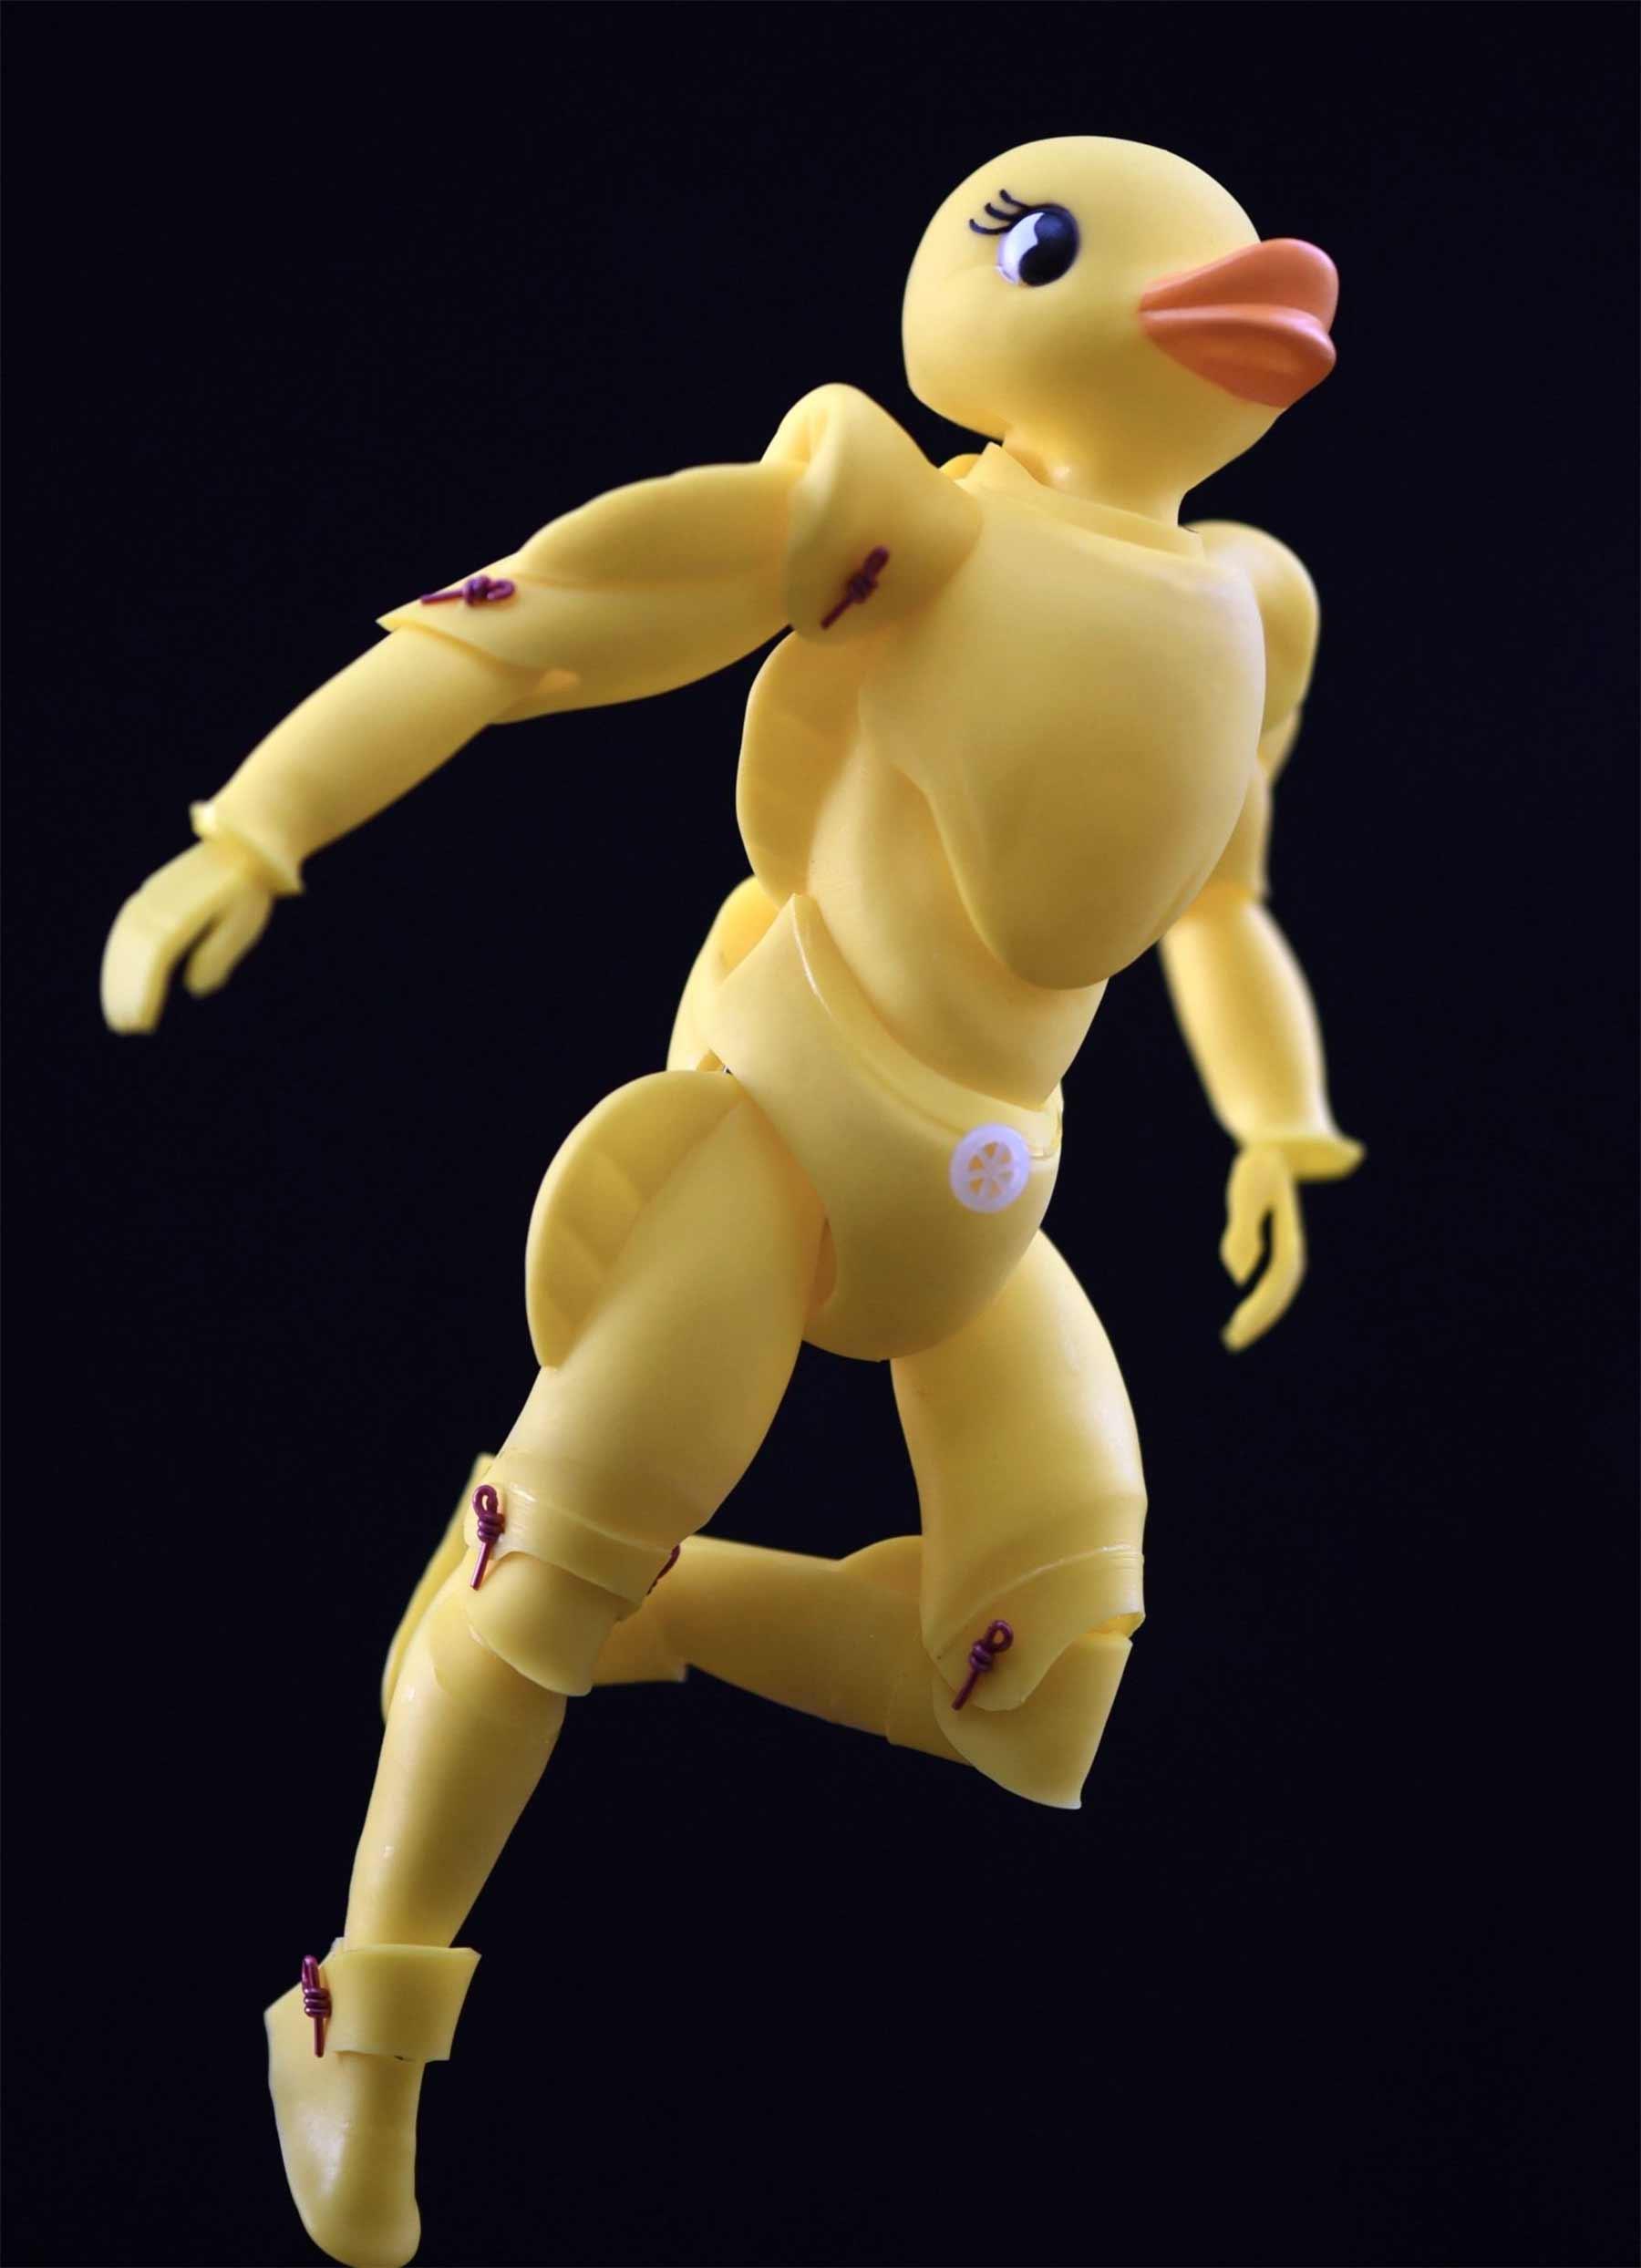 Quietscheentchen-Actionfigur quietscheentchen-actionfiguren-Tomohiro-Yasui_02